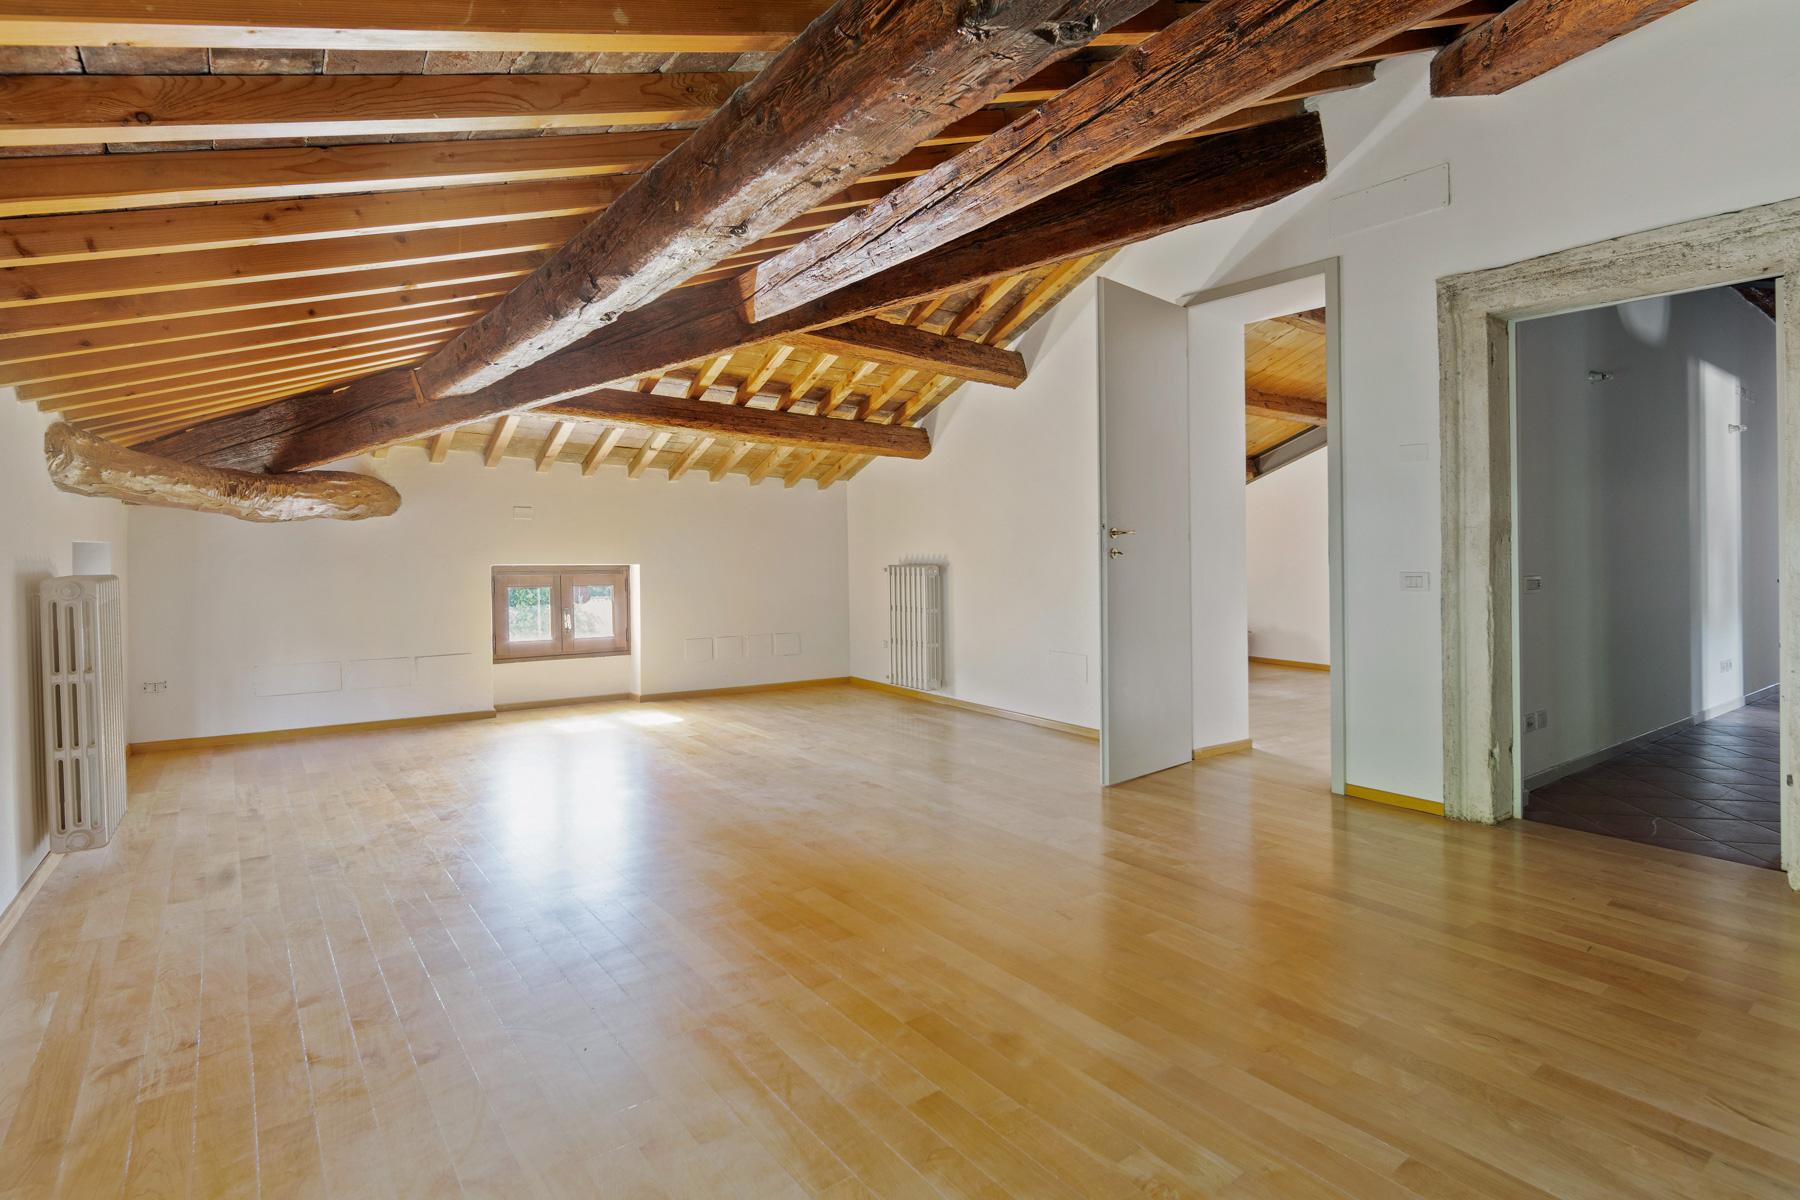 Villa in Vendita a Verona: 5 locali, 890 mq - Foto 17